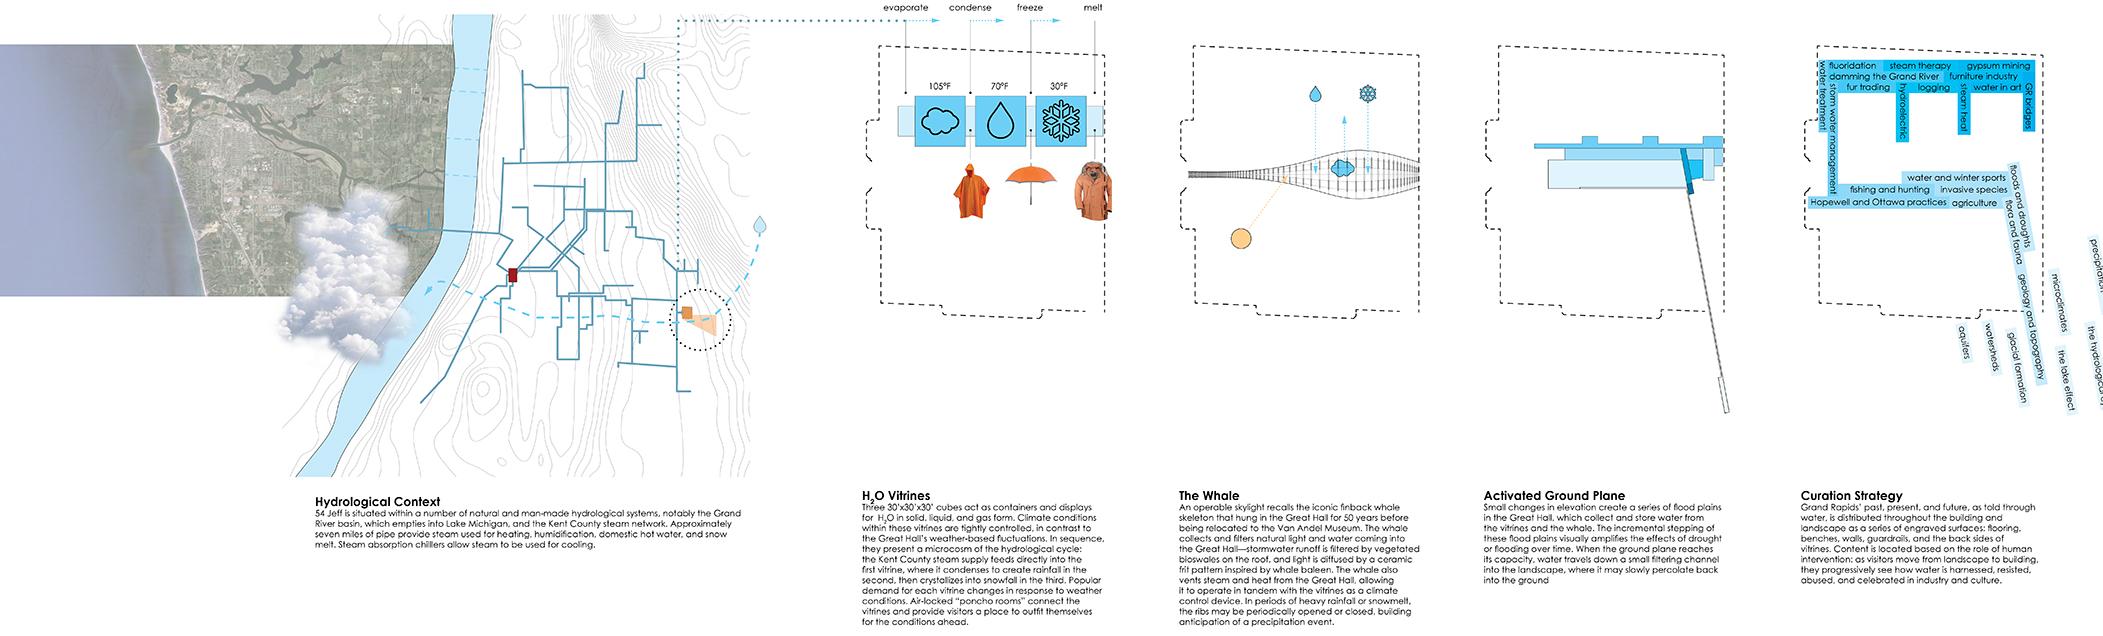 ThinkTank-DiagramStripShort.jpg